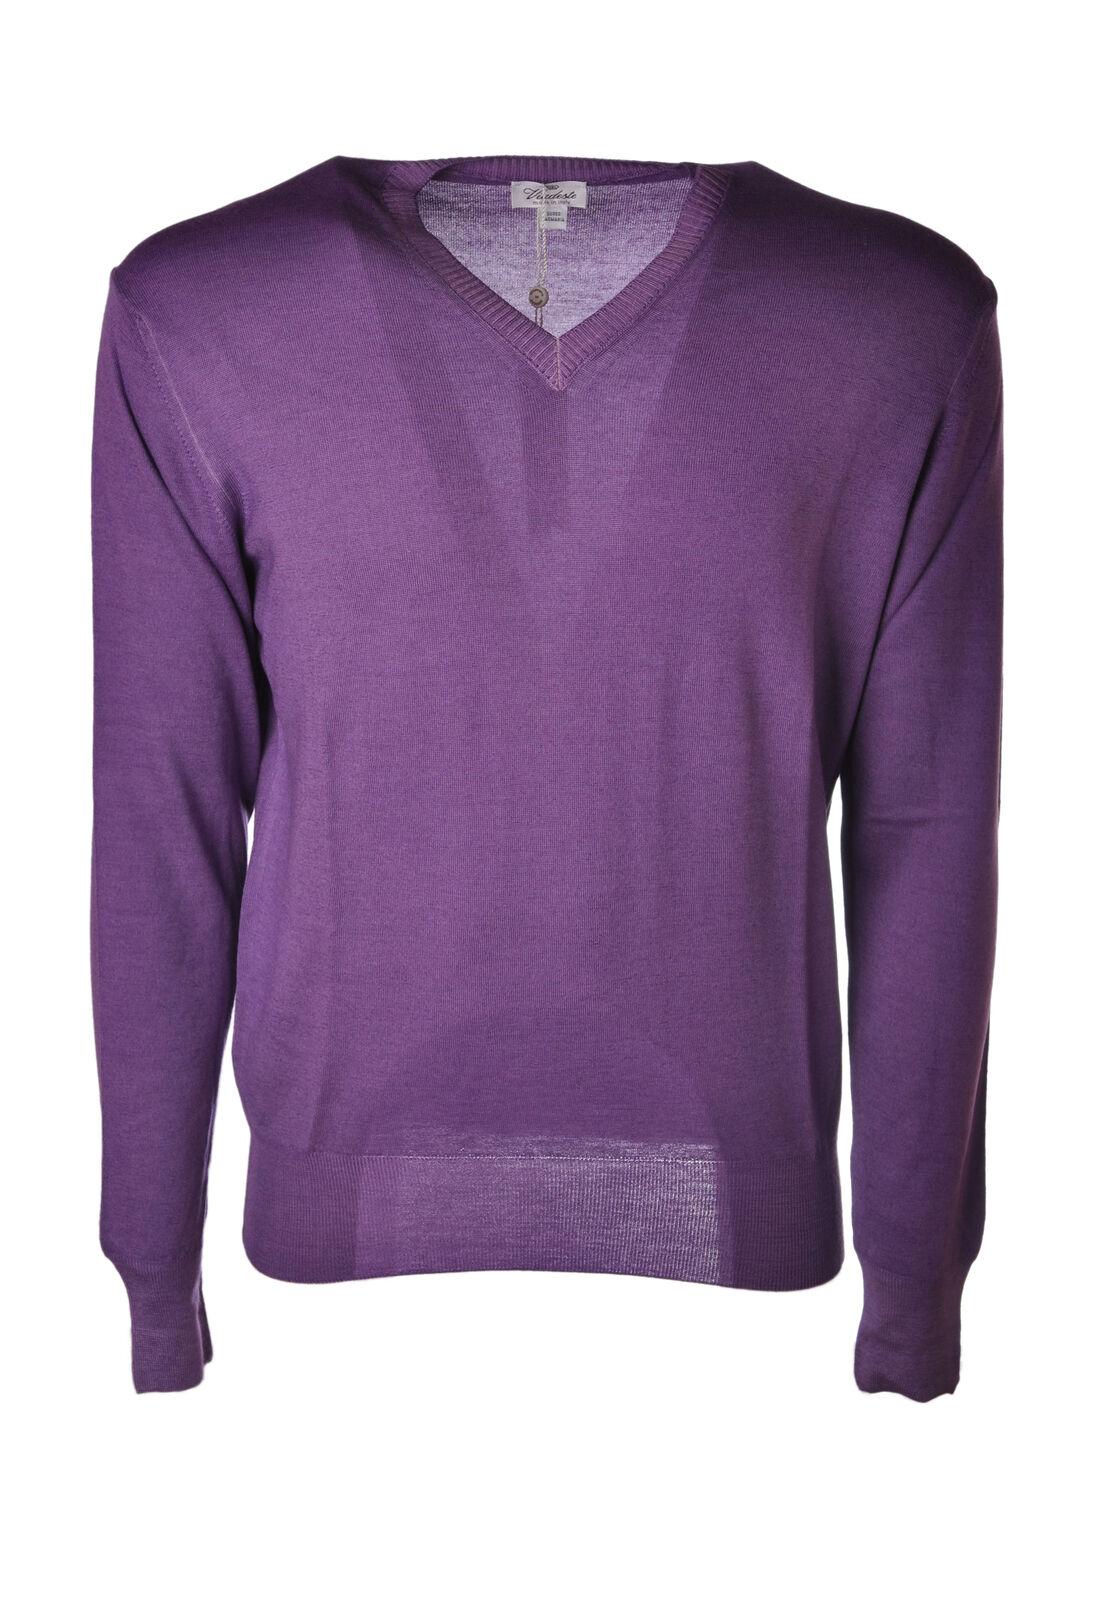 Viadeste  -  Sweaters - Male - Viola - 4678721A185711